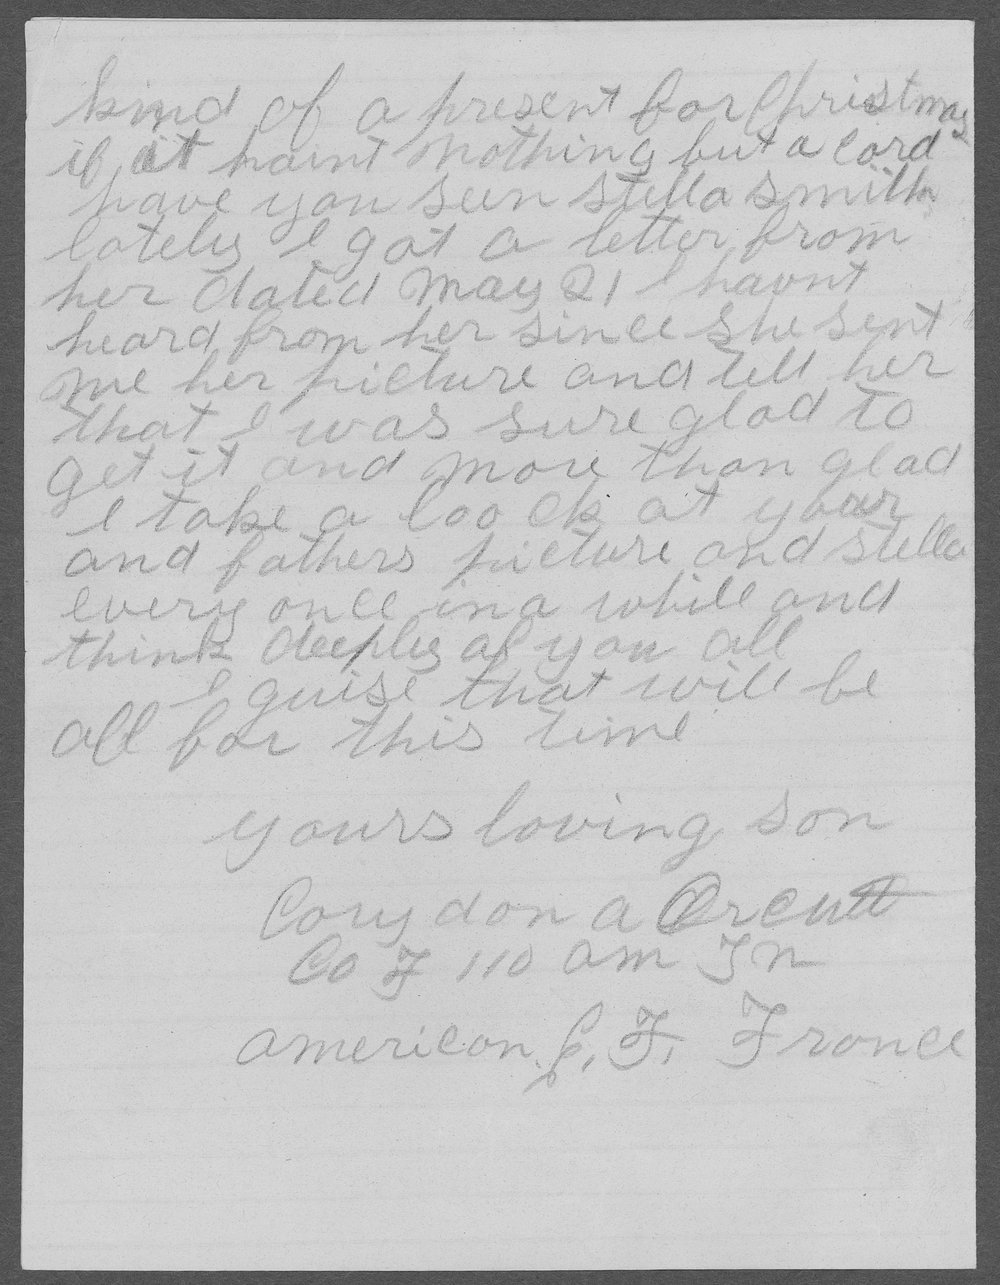 Corydon Orcutt, World War I soldier - 12